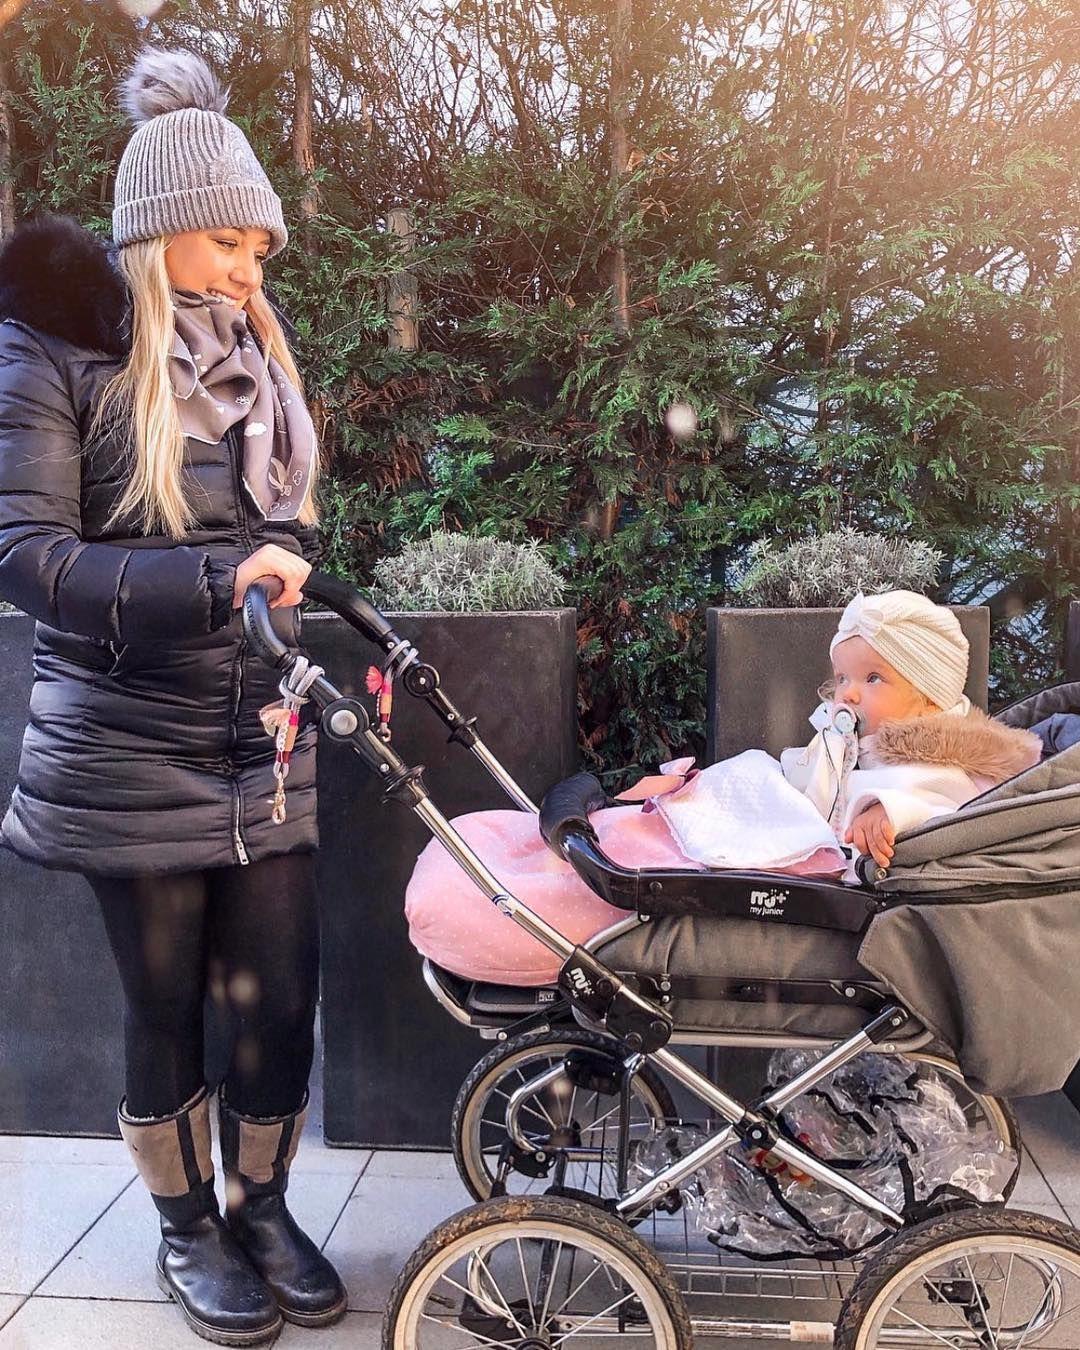 Baby Spaziergang Spanische Mode Baby Accessoires Baby